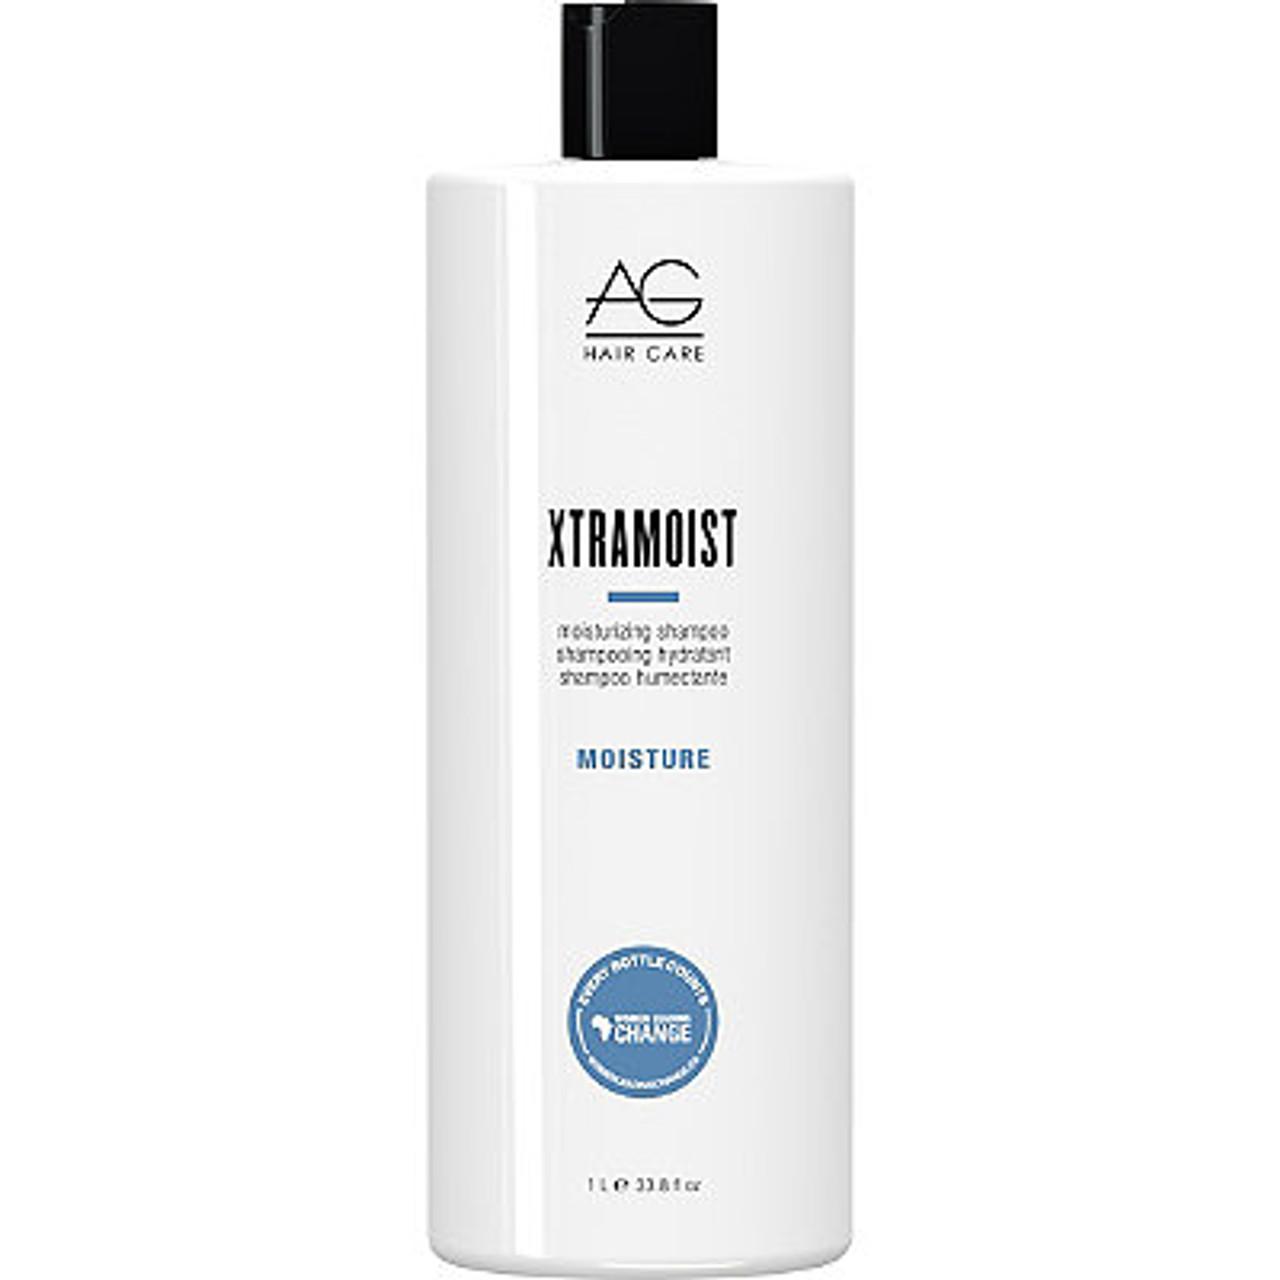 AG Hair Xtramoist Shampoo, 1L